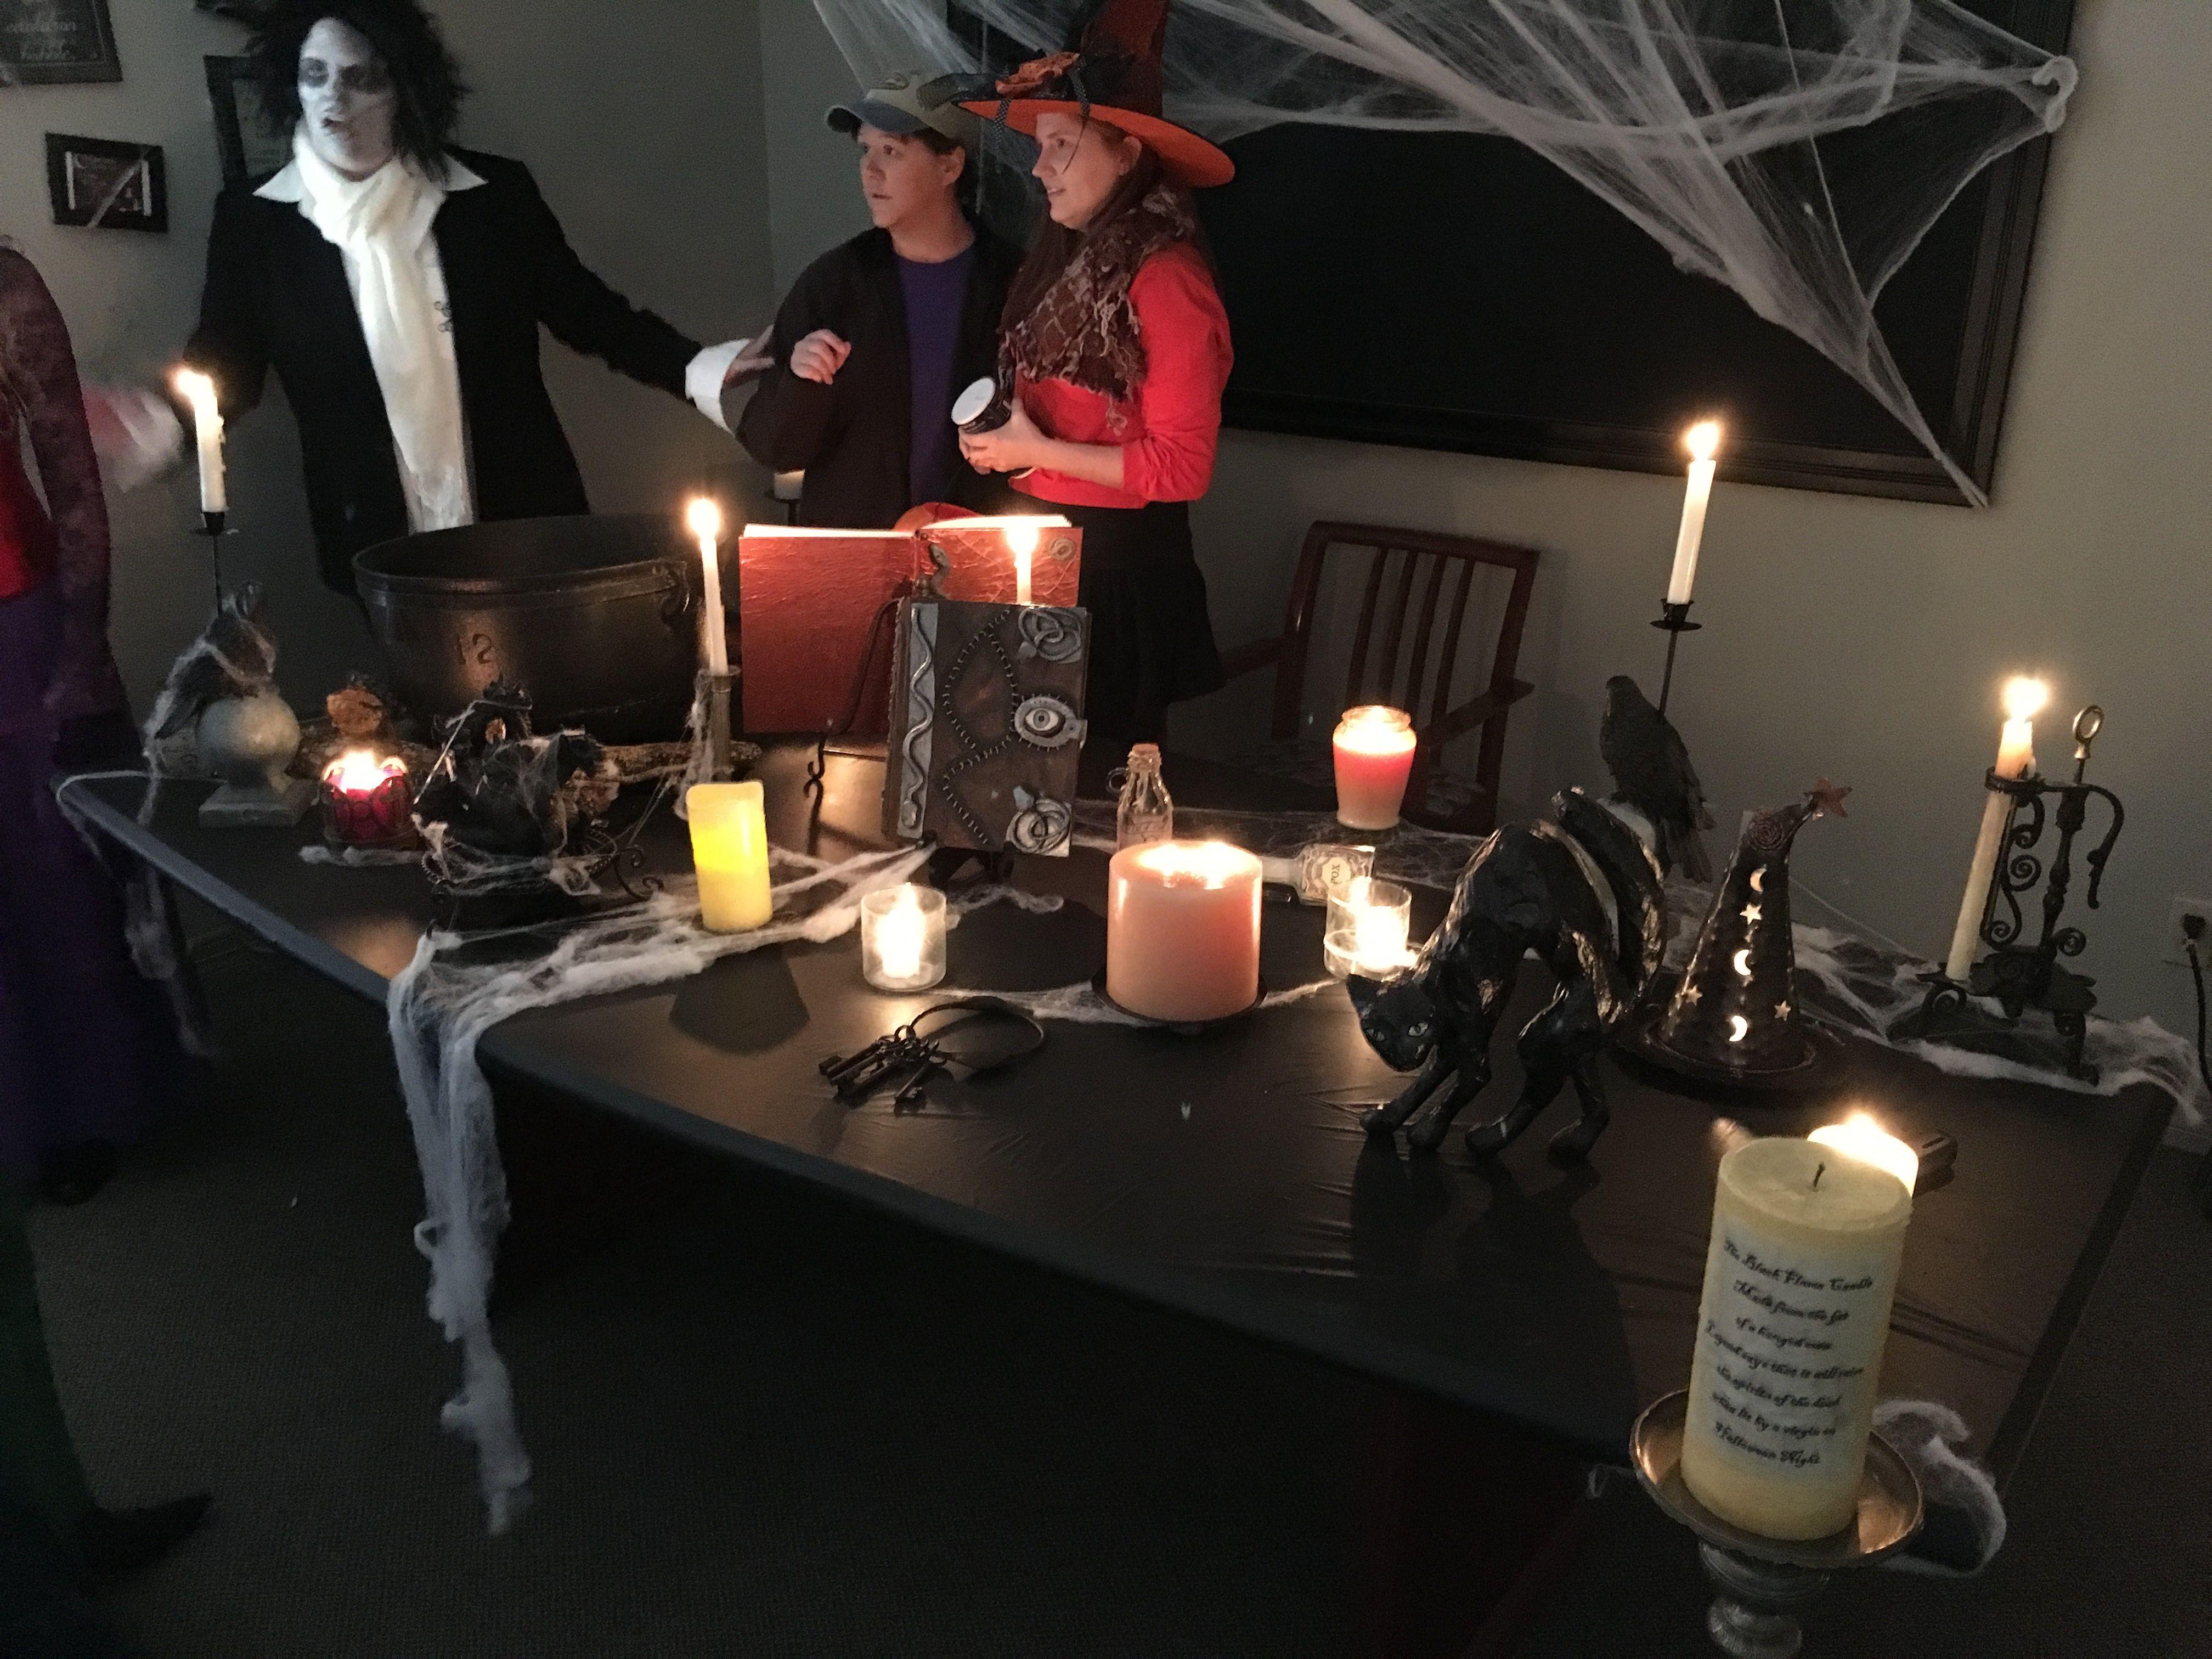 Hocus Pocus Halloween office costume party decor